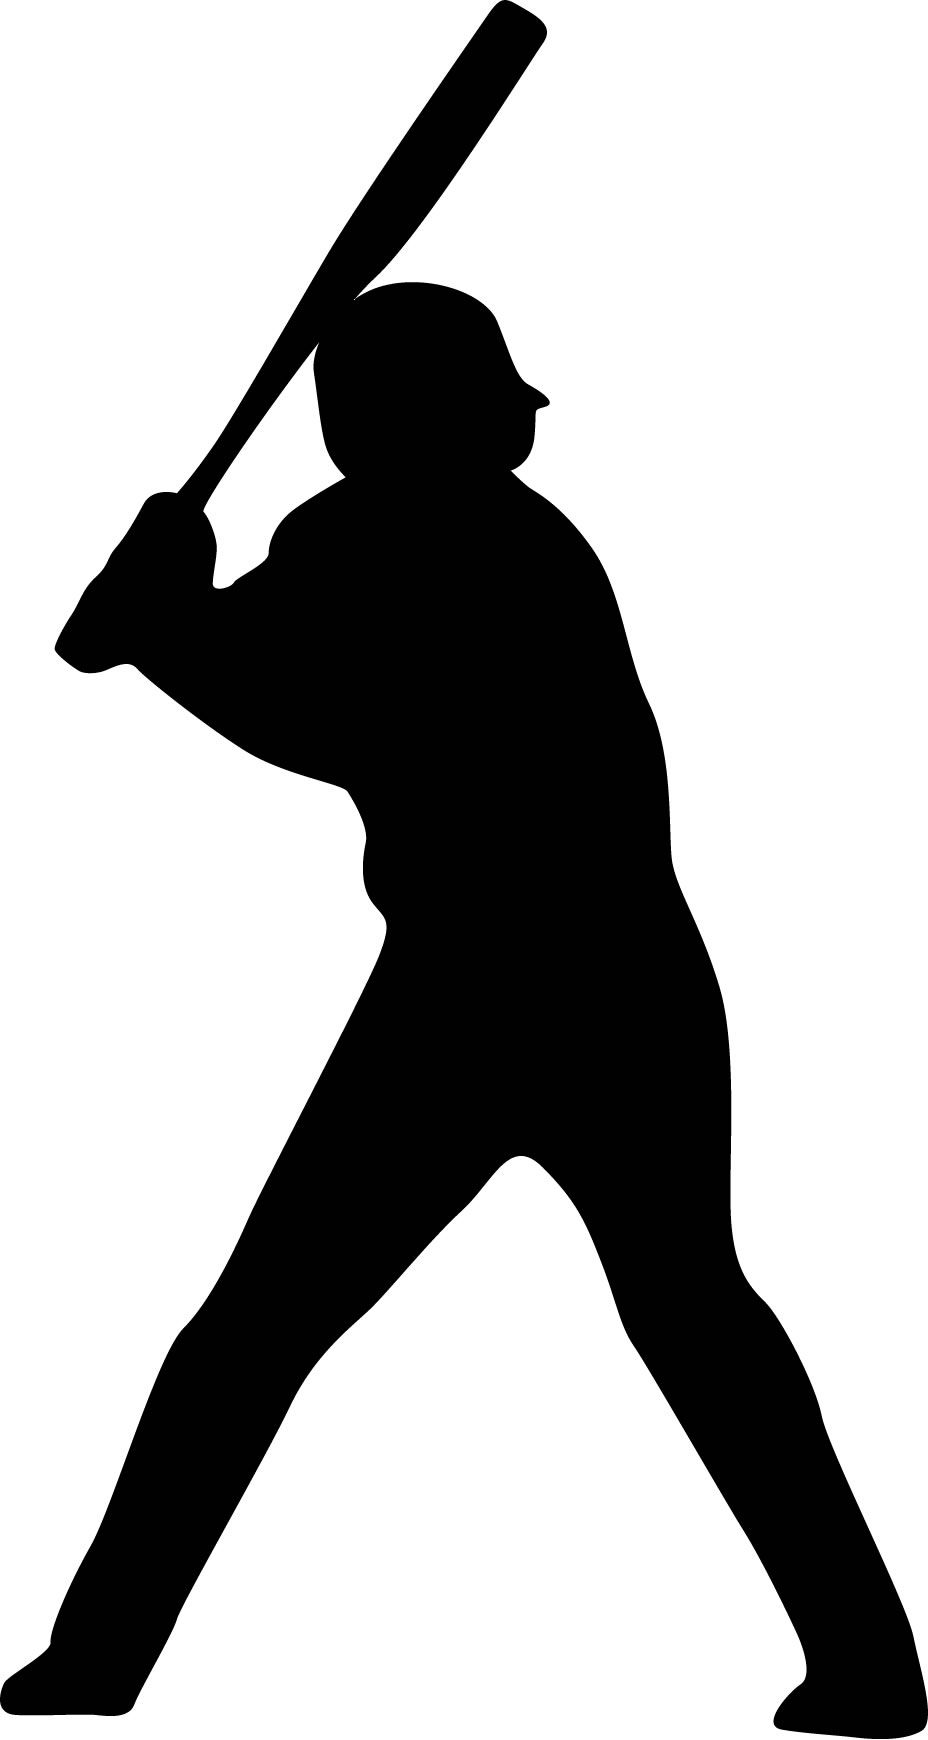 Baseball Player Batting Stance Righty Silhouette : Custom.